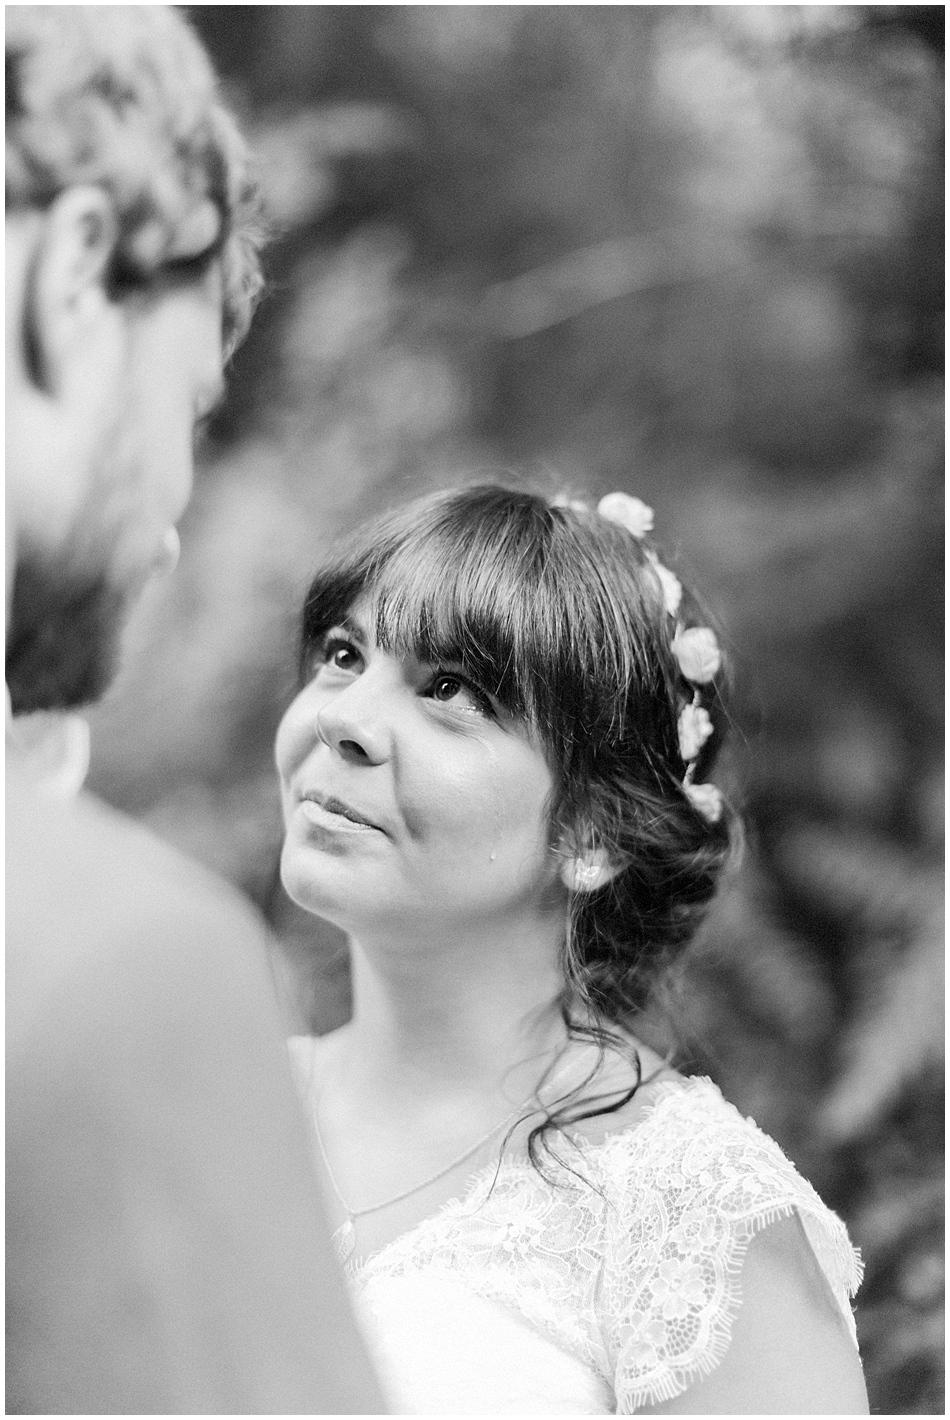 Marie-Alice G-Photographe Mariage France Normandie - Photographe Mariage Manche valognes cherbourg - Wedding Photographer France_0162